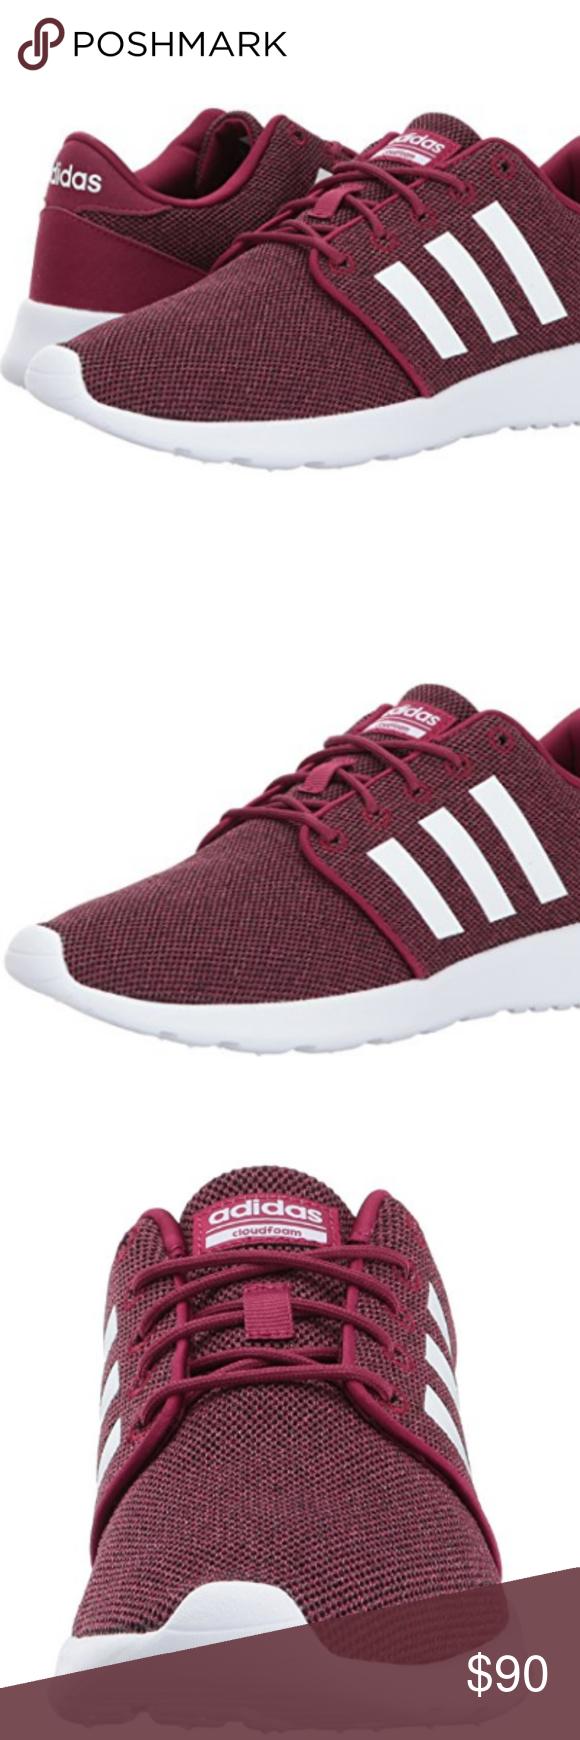 Adidas Donne Pilota Di Qt Scarpe Da Corsa Boutique Pinterest